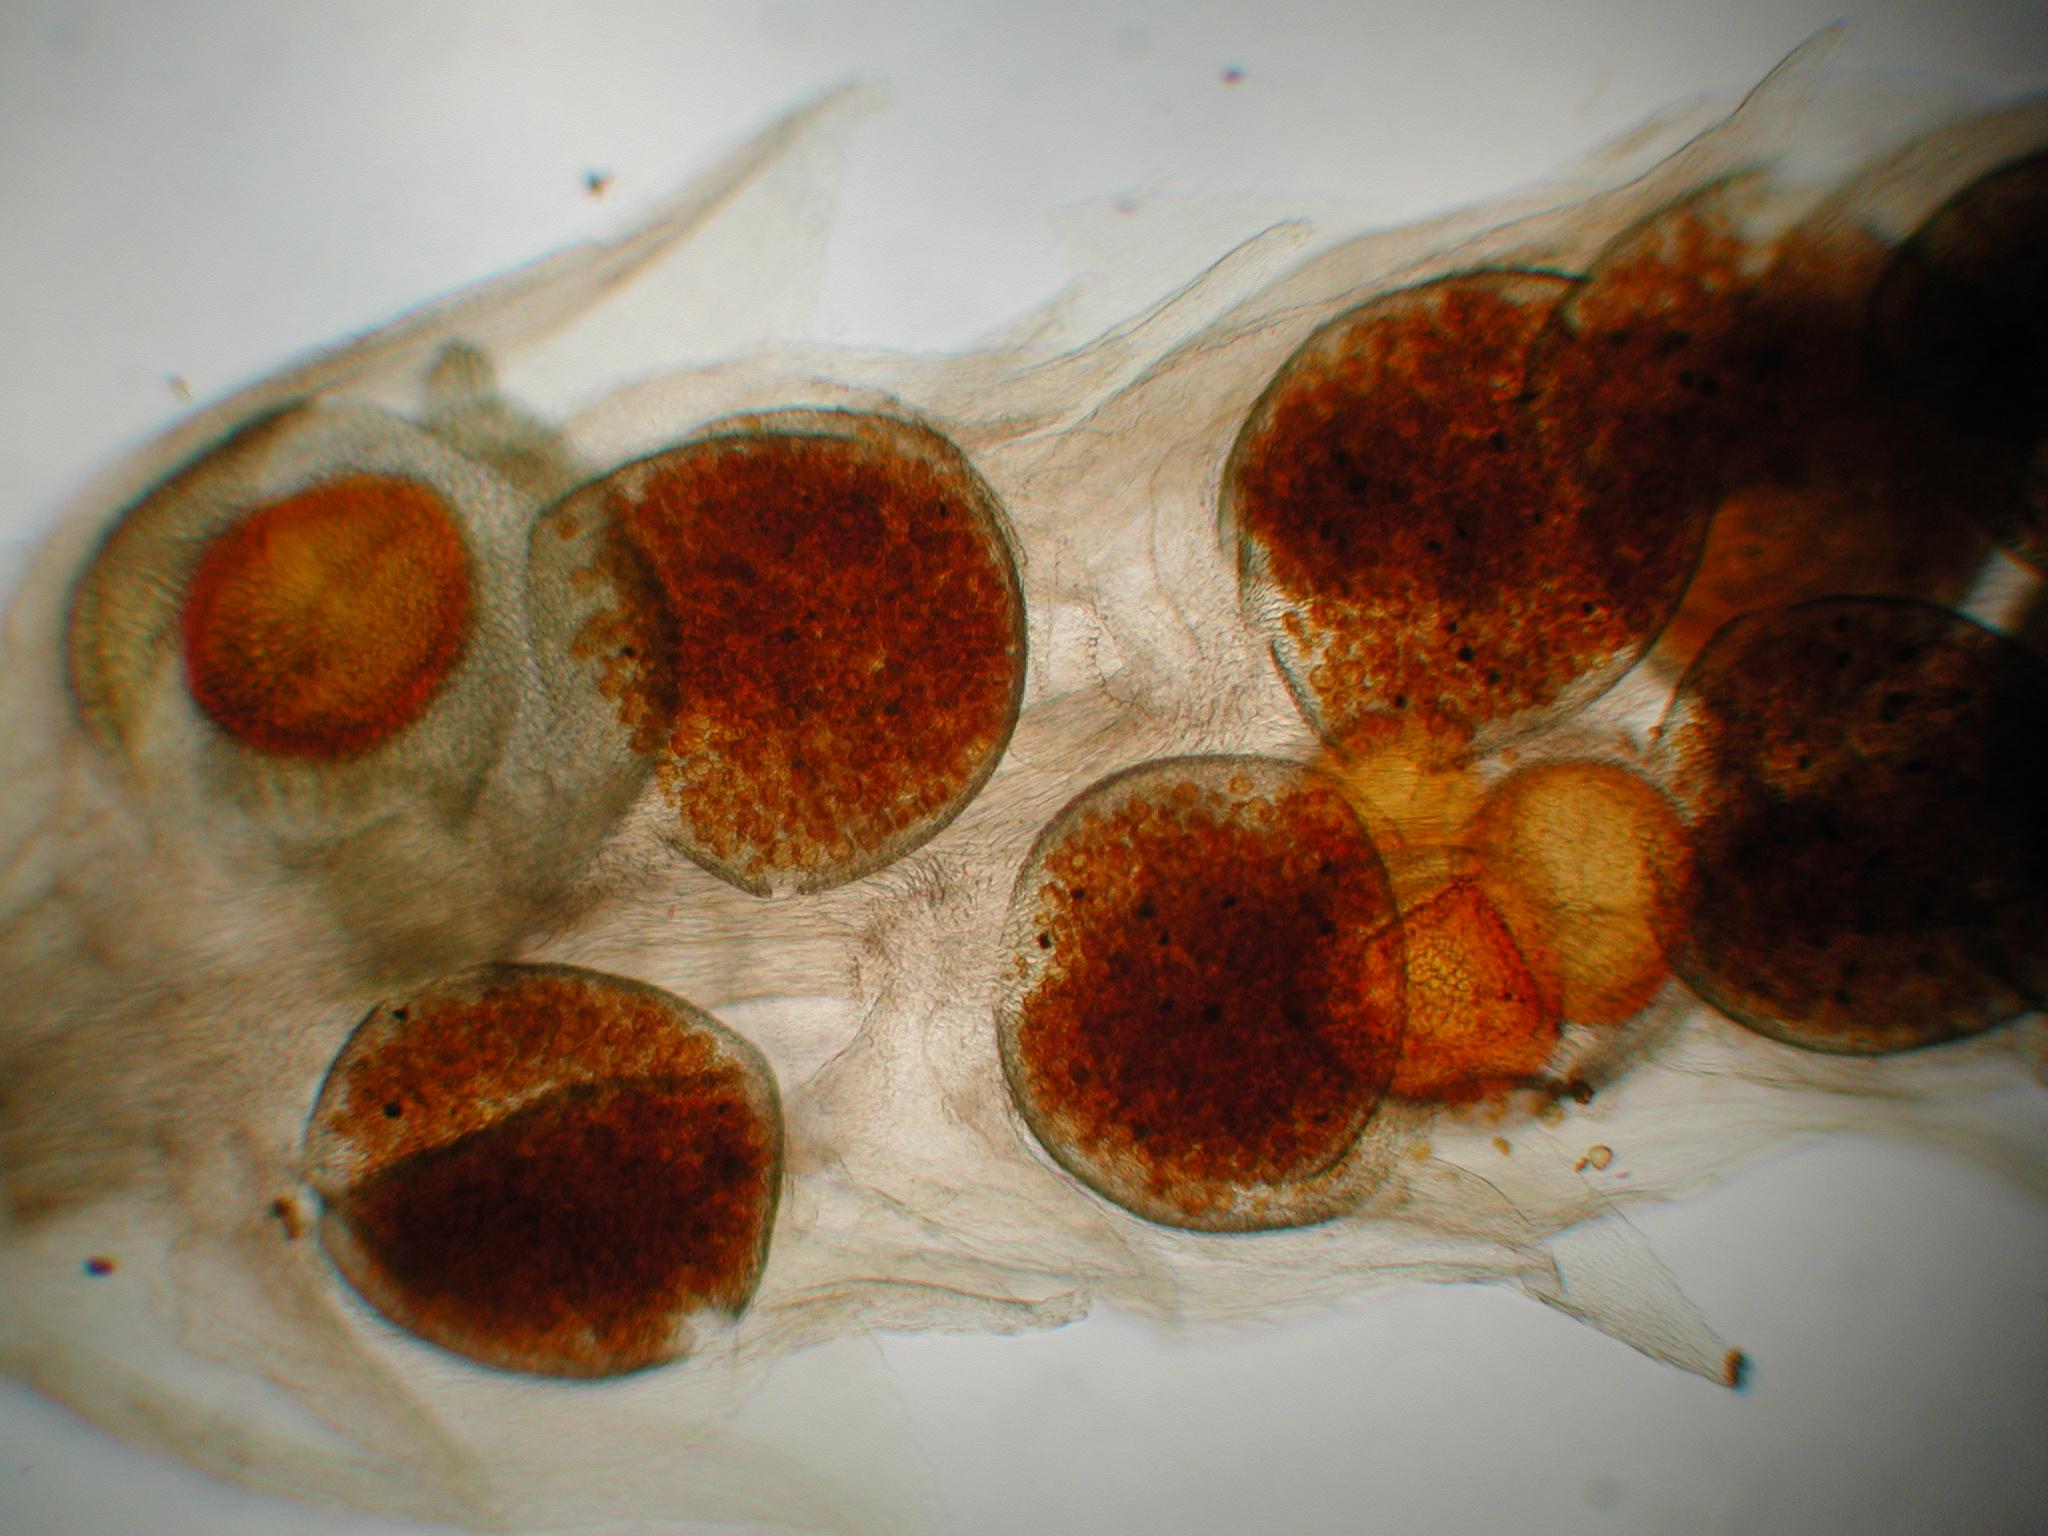 Microspores and Megaspores of Selaginella